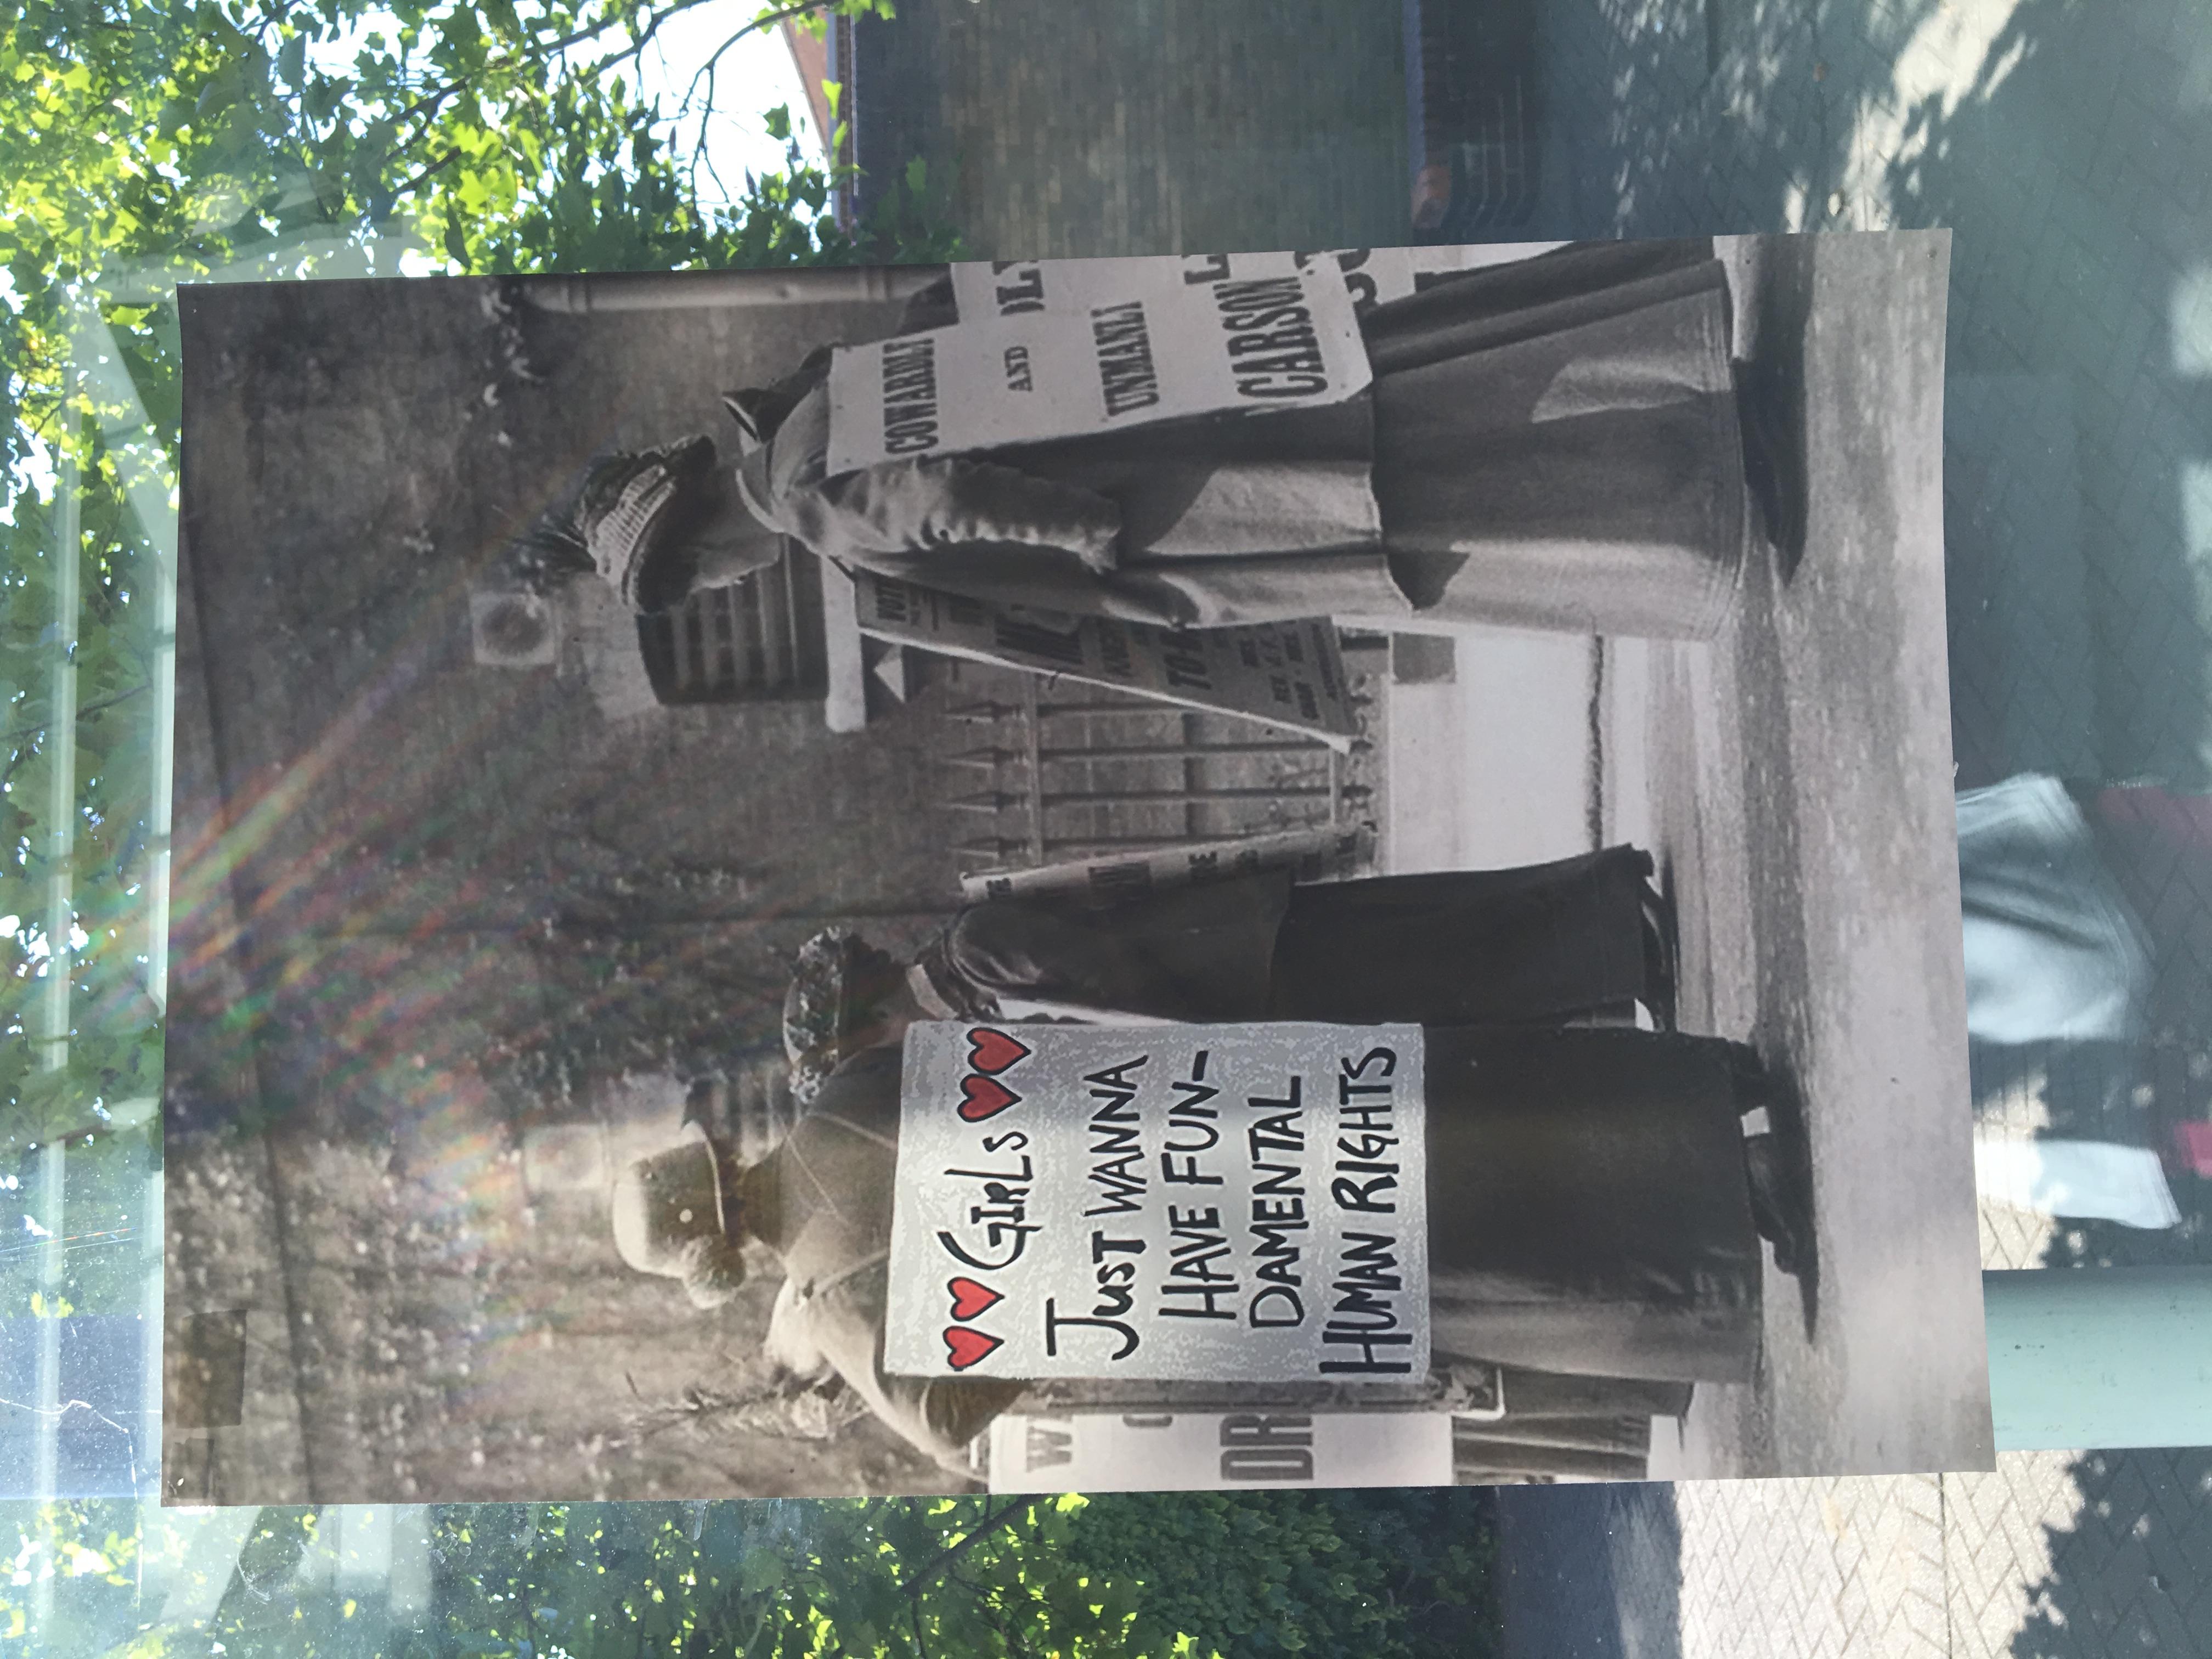 58d. Suffragette Marches, Felicity Beaumont, 40.5 x 59 x 0.1, £ offers